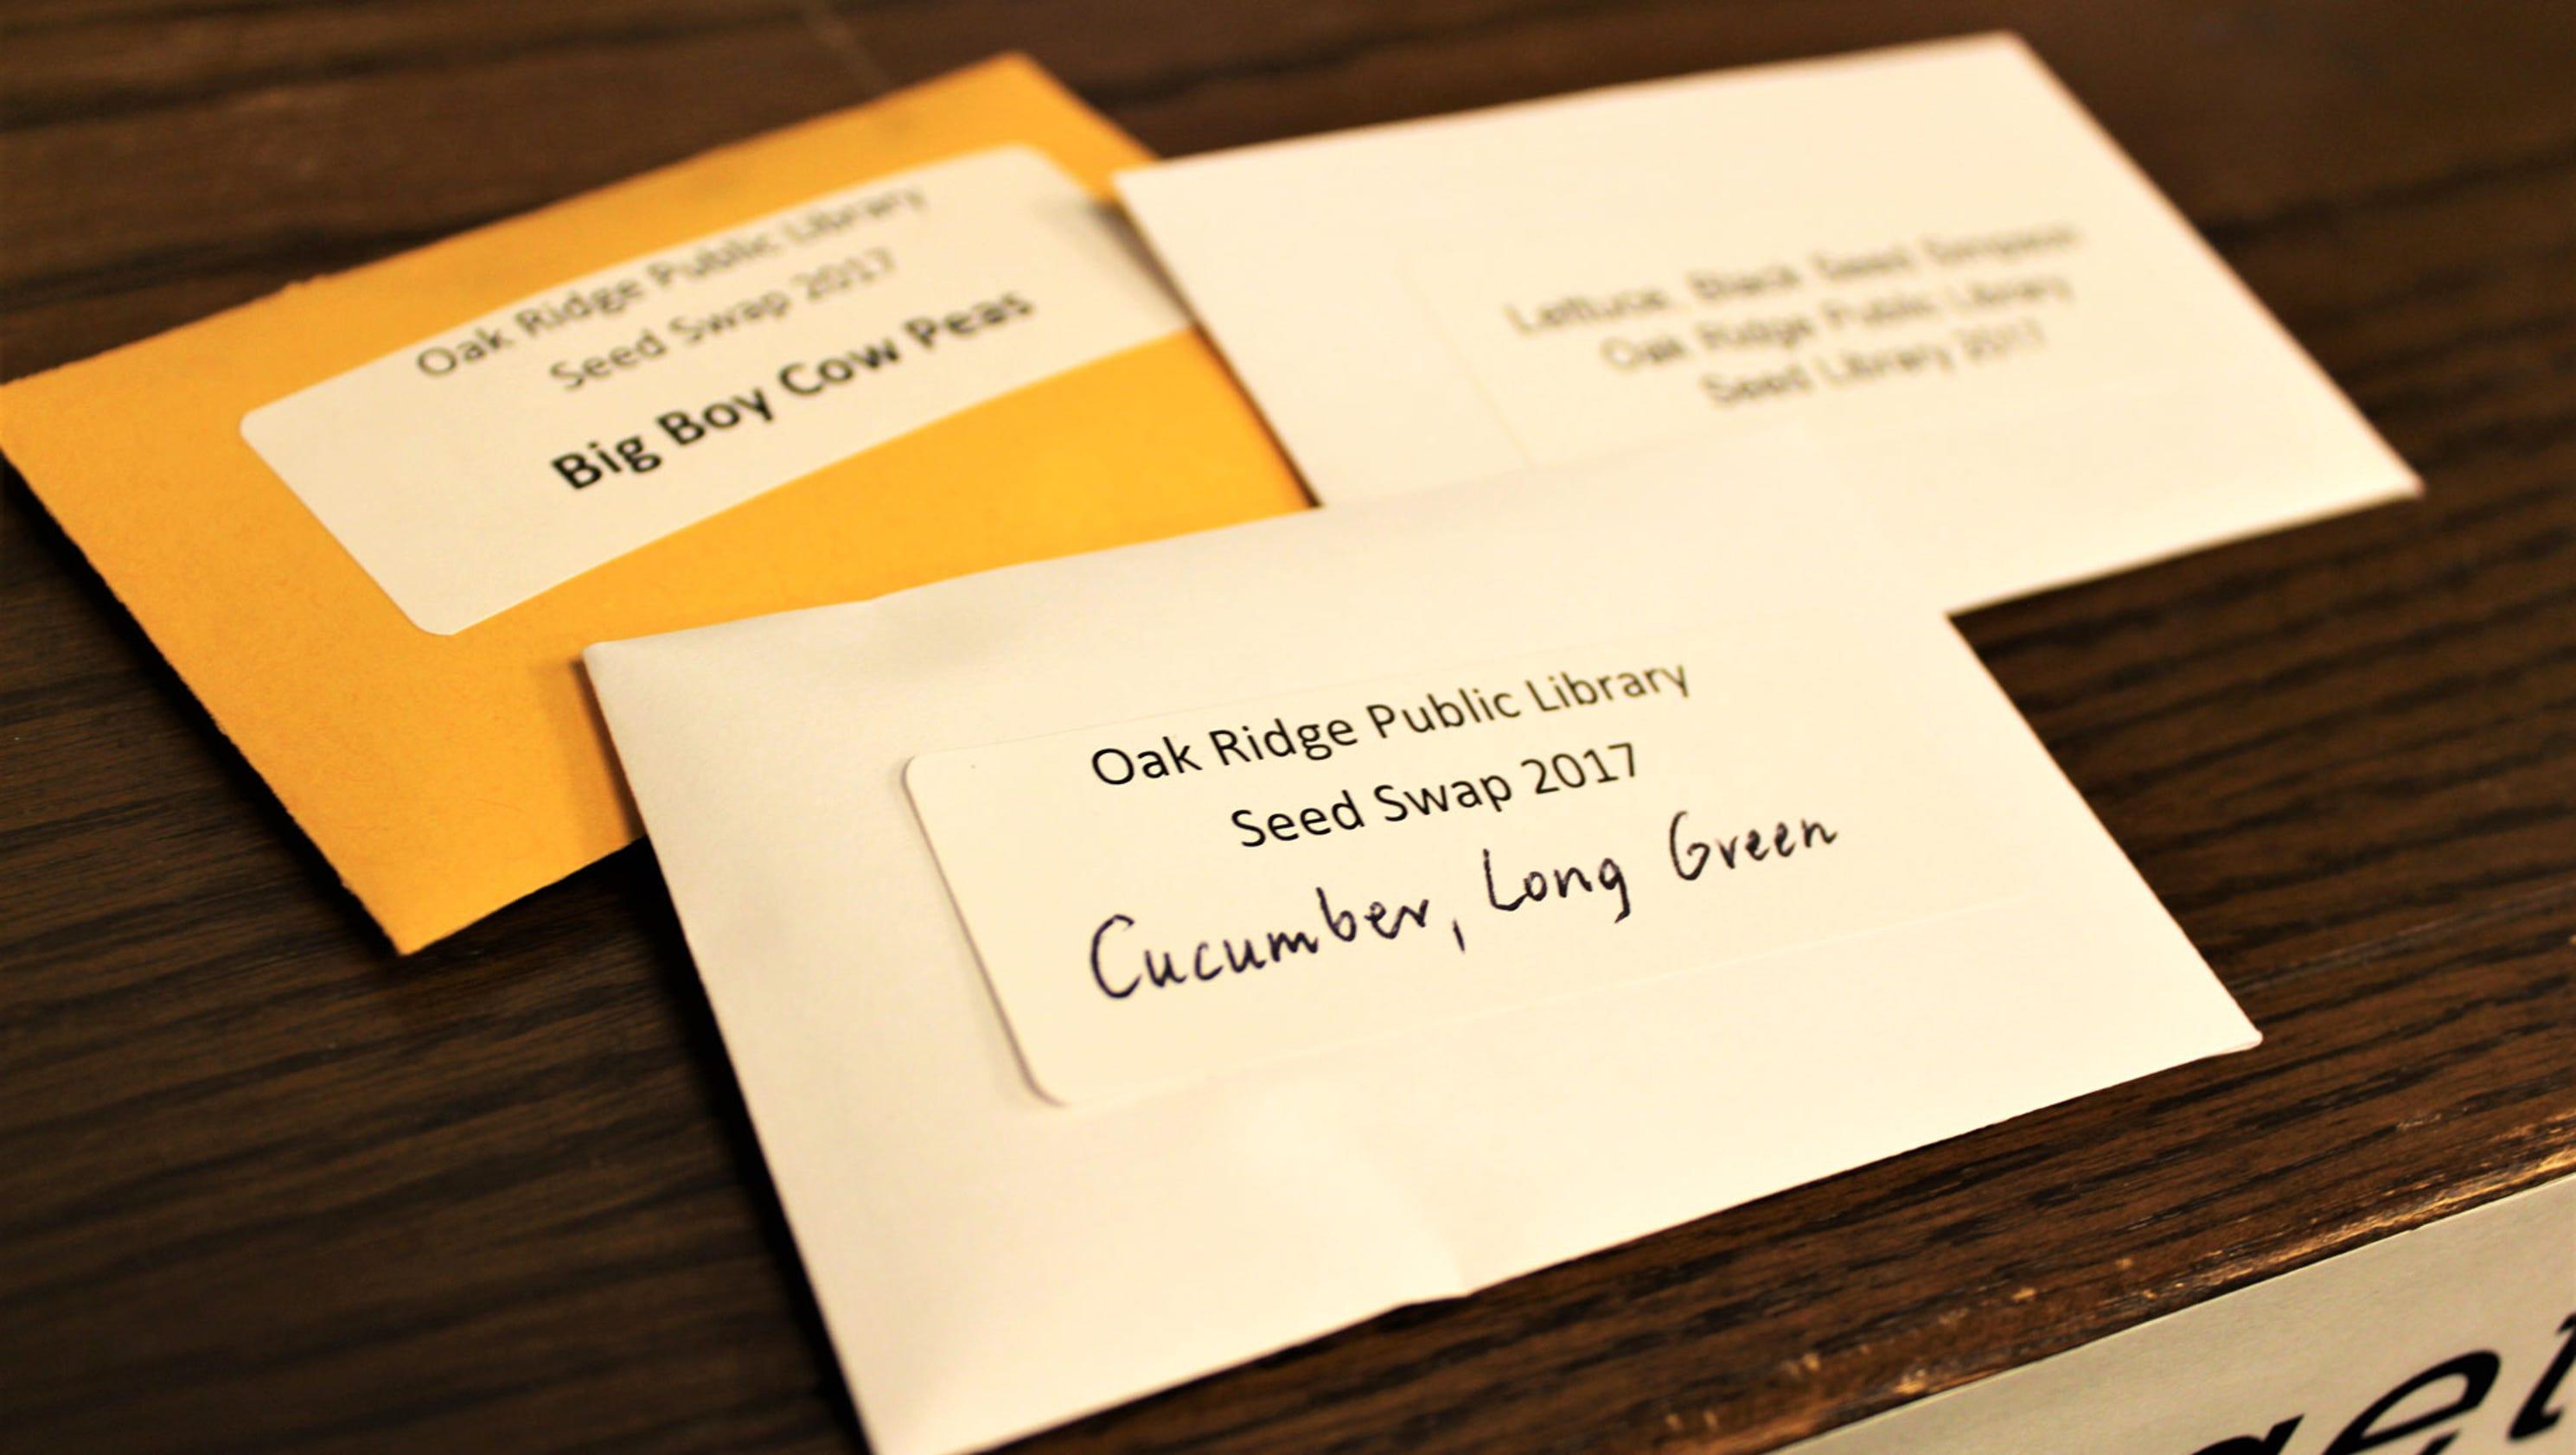 Oak Ridge Public Library launches seed exchange